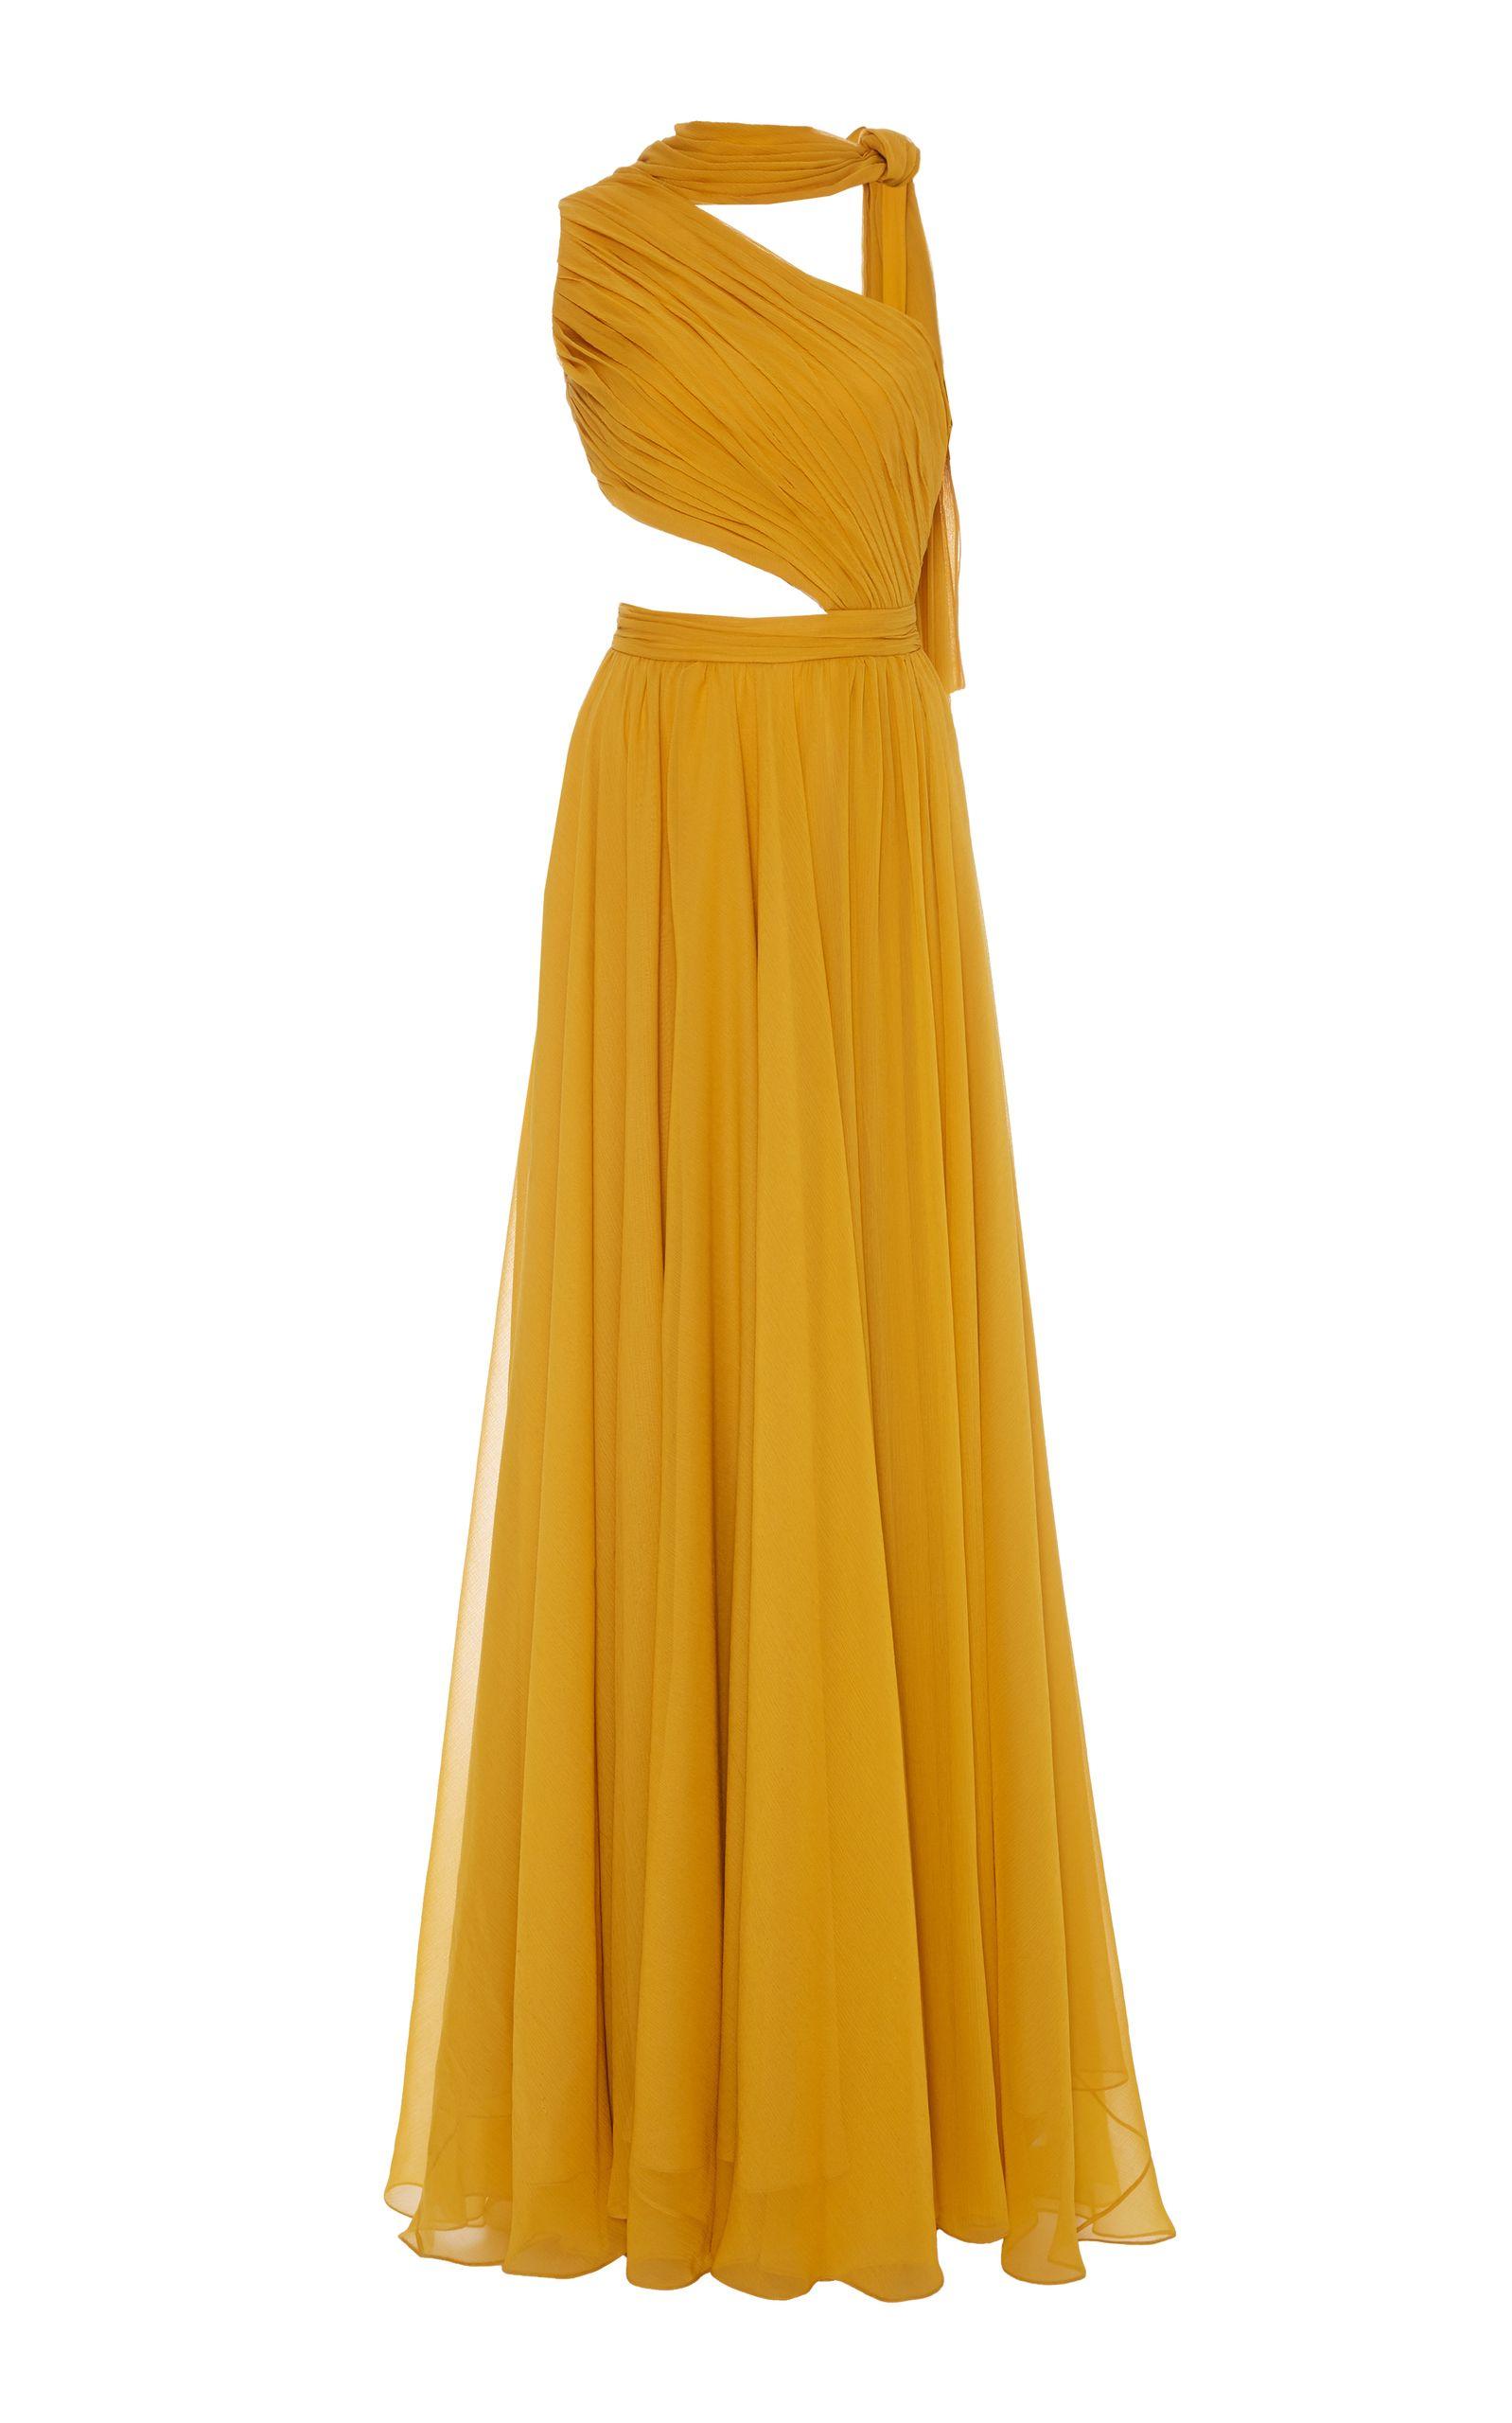 29cb21e508b7 Asymmetric Drape Goddess Gown by PRABAL GURUNG for Preorder on Moda Operandi